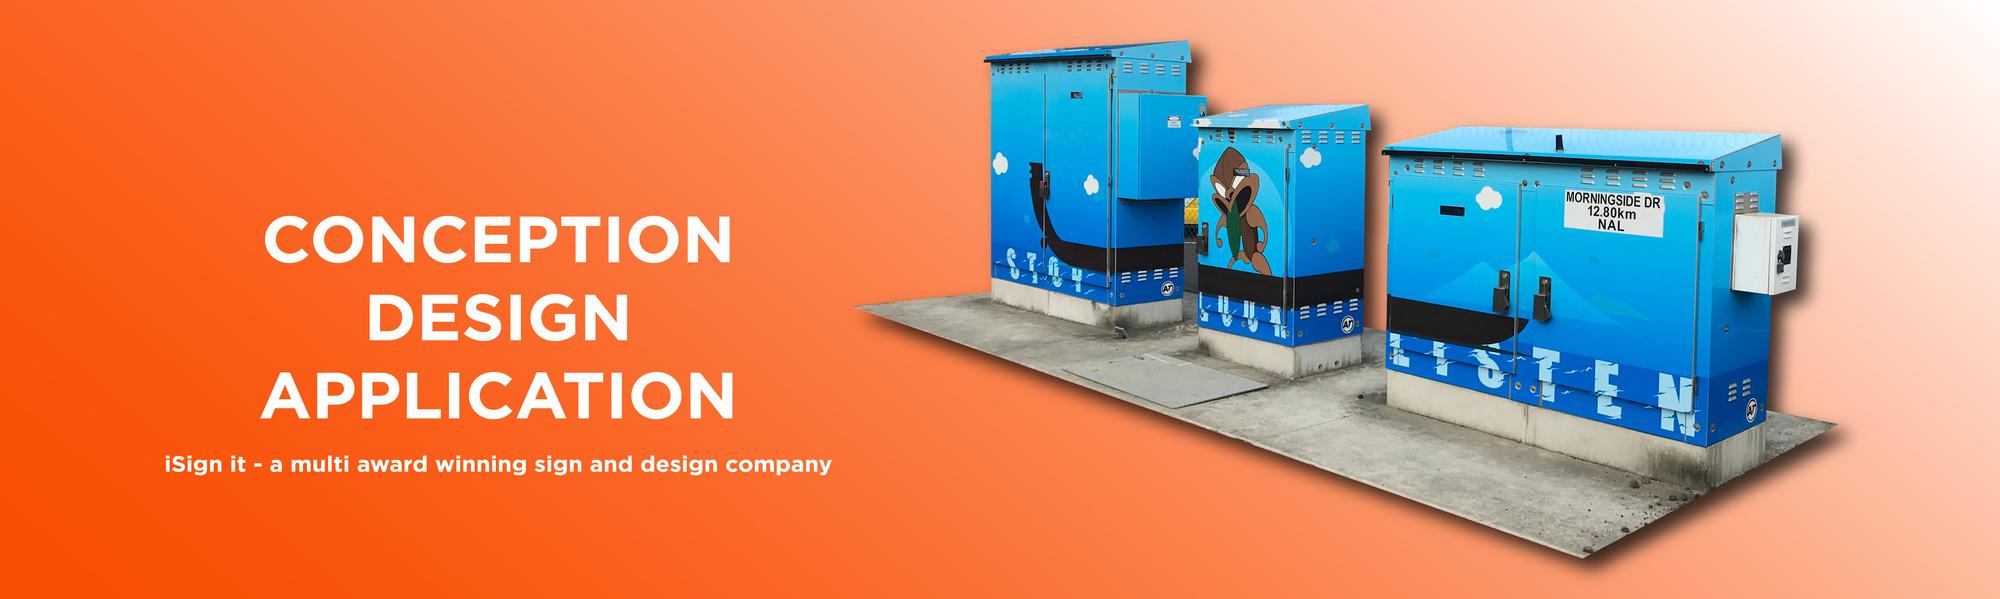 Railway_boxes.jpg